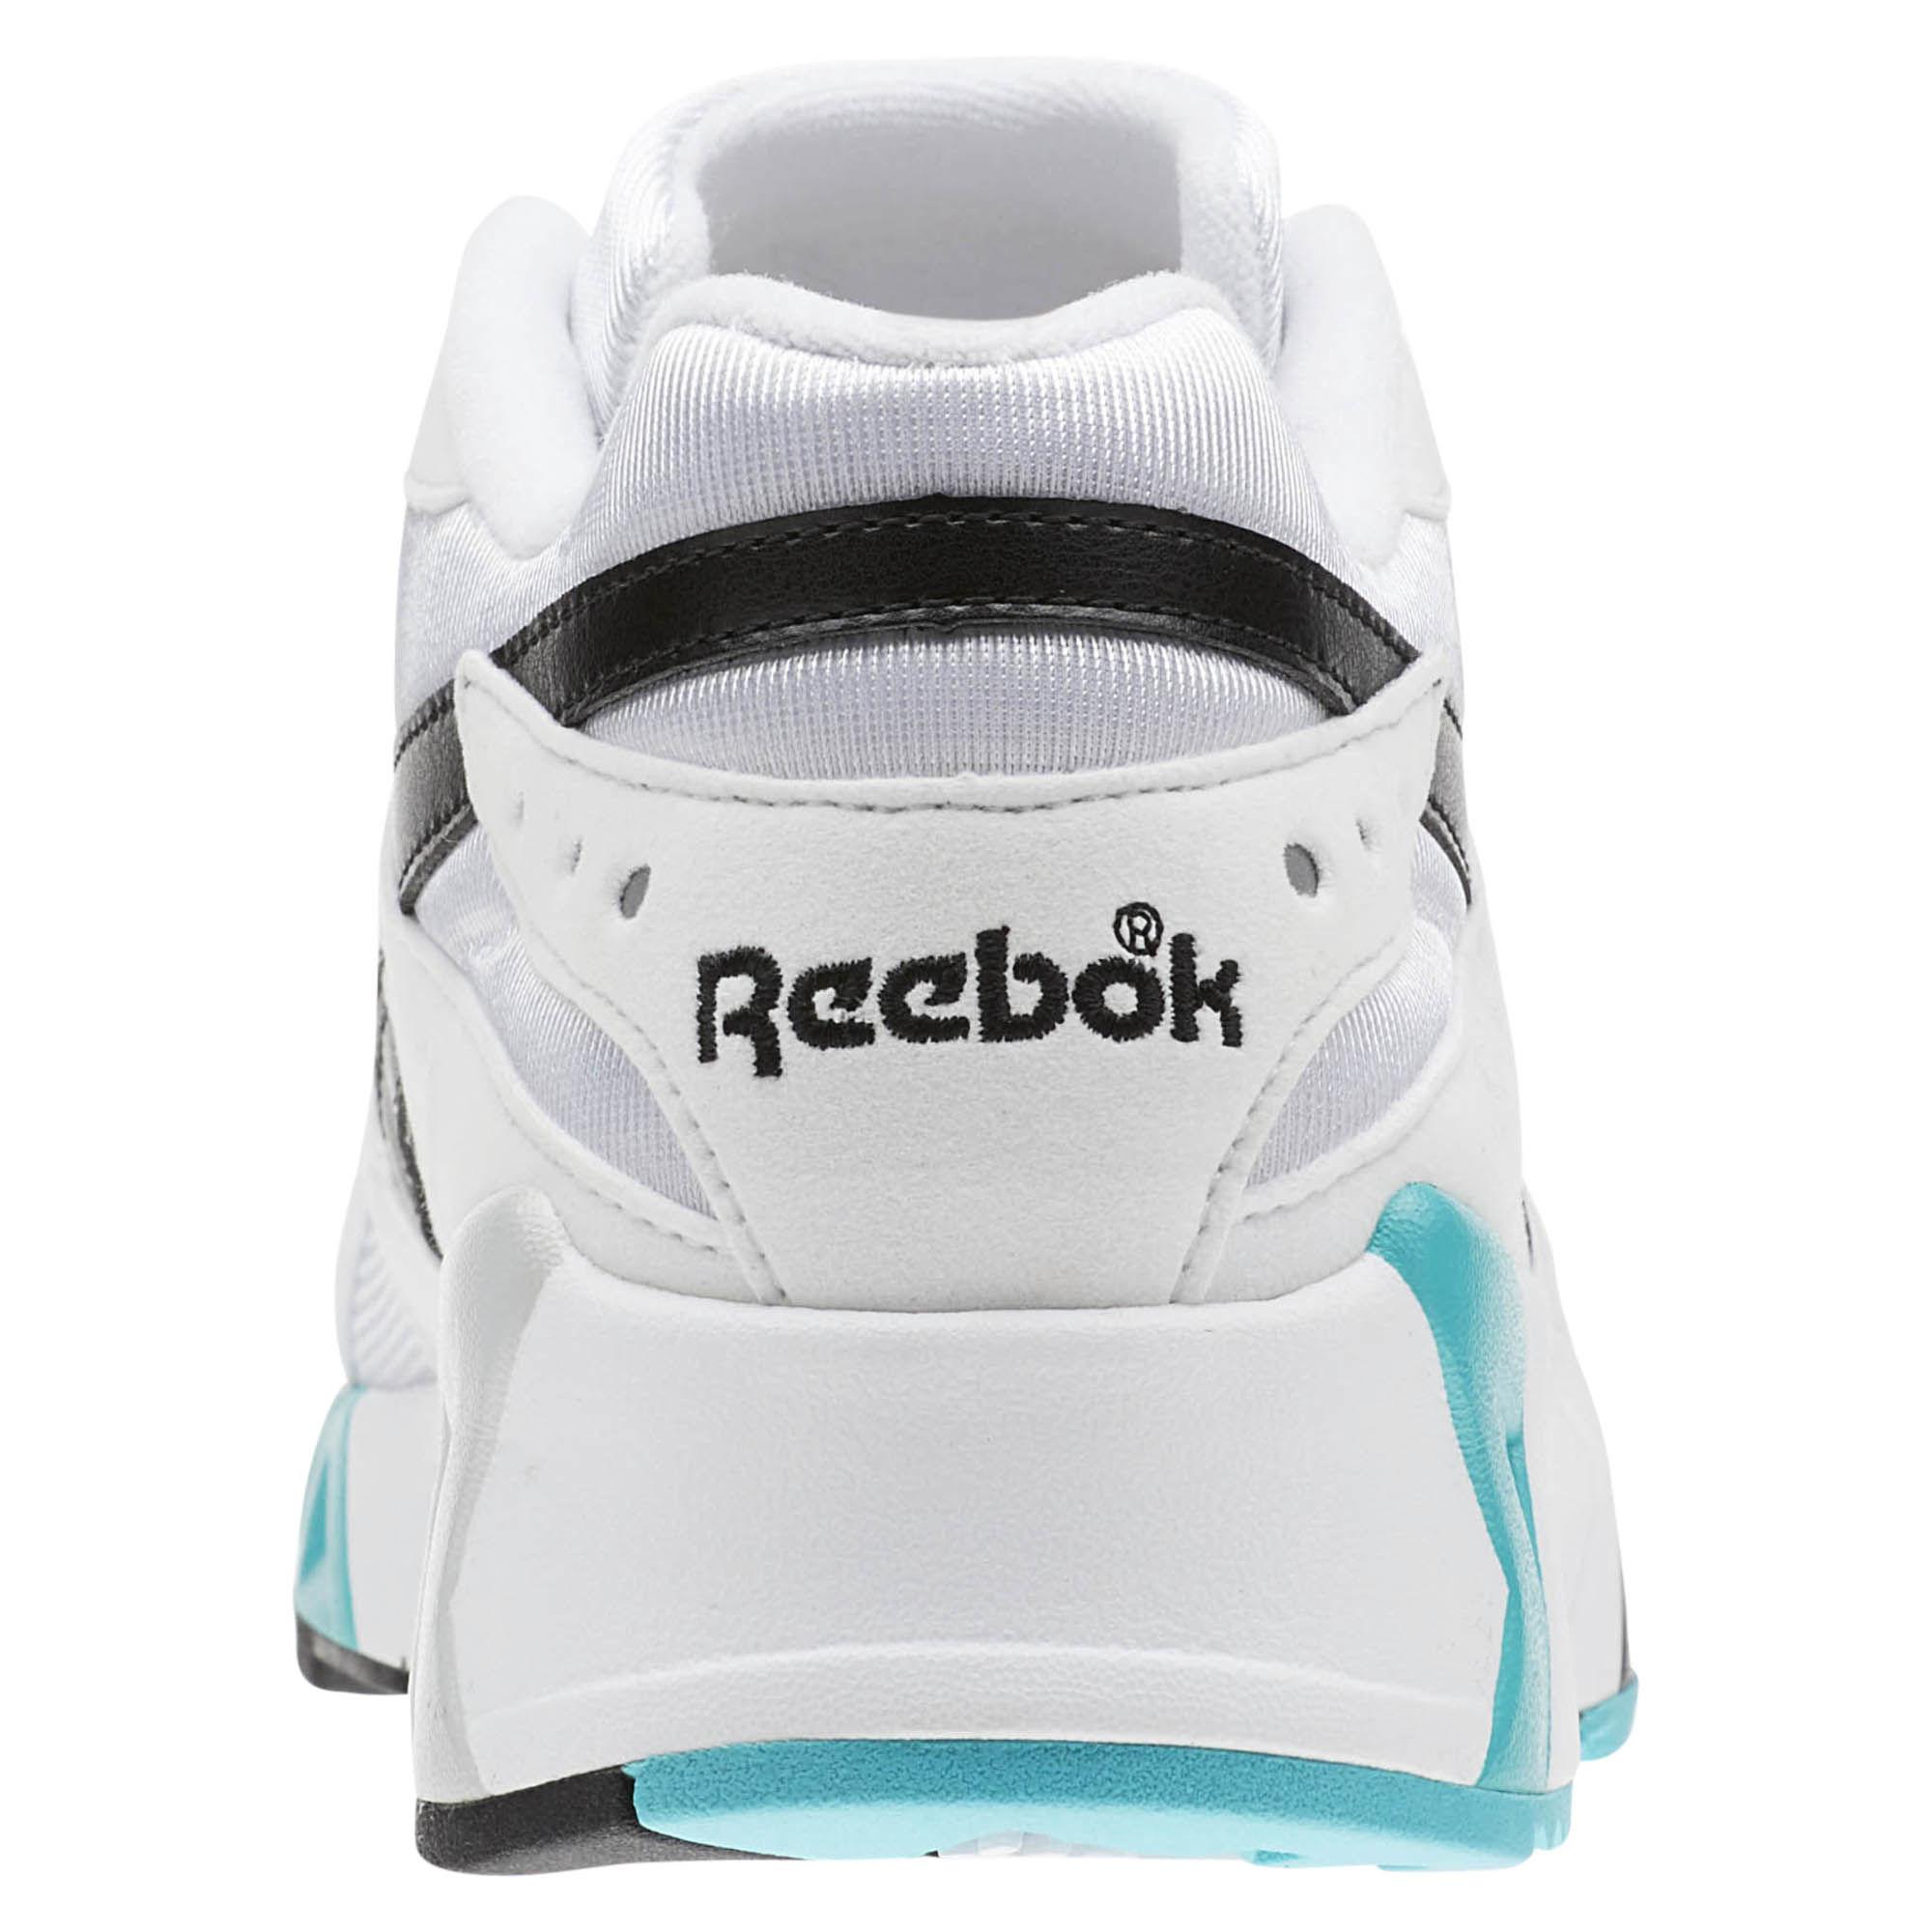 Reebok Aztrek OG White/Solid Teal/Black (CN7067)